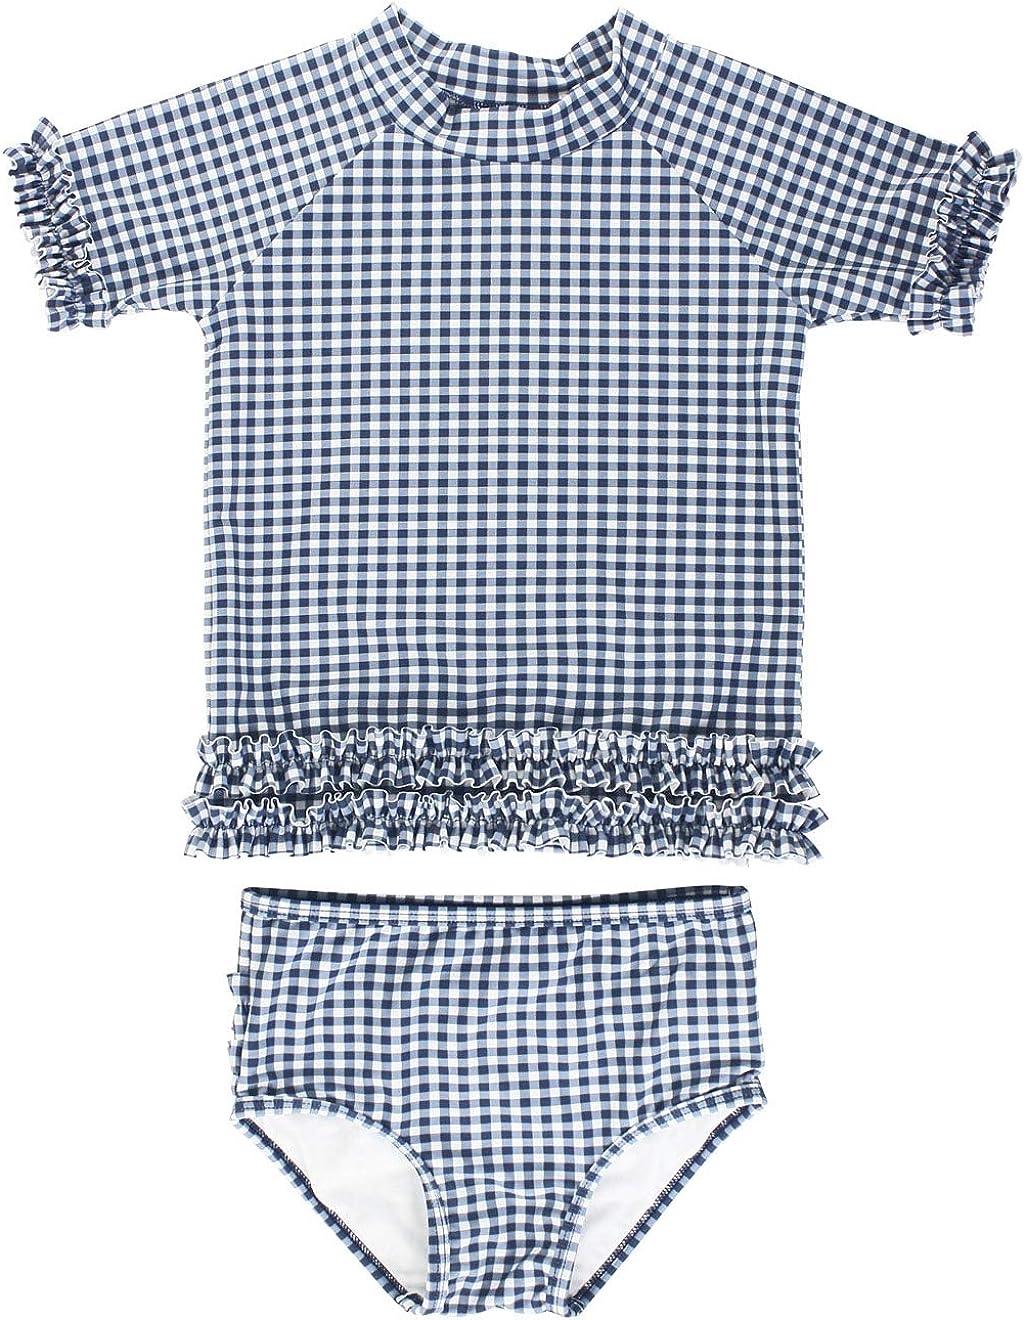 Sun Protection RuffleButts Girls Short Sleeve Printed Rash Guard Two Piece Swimsuit Set UPF 50